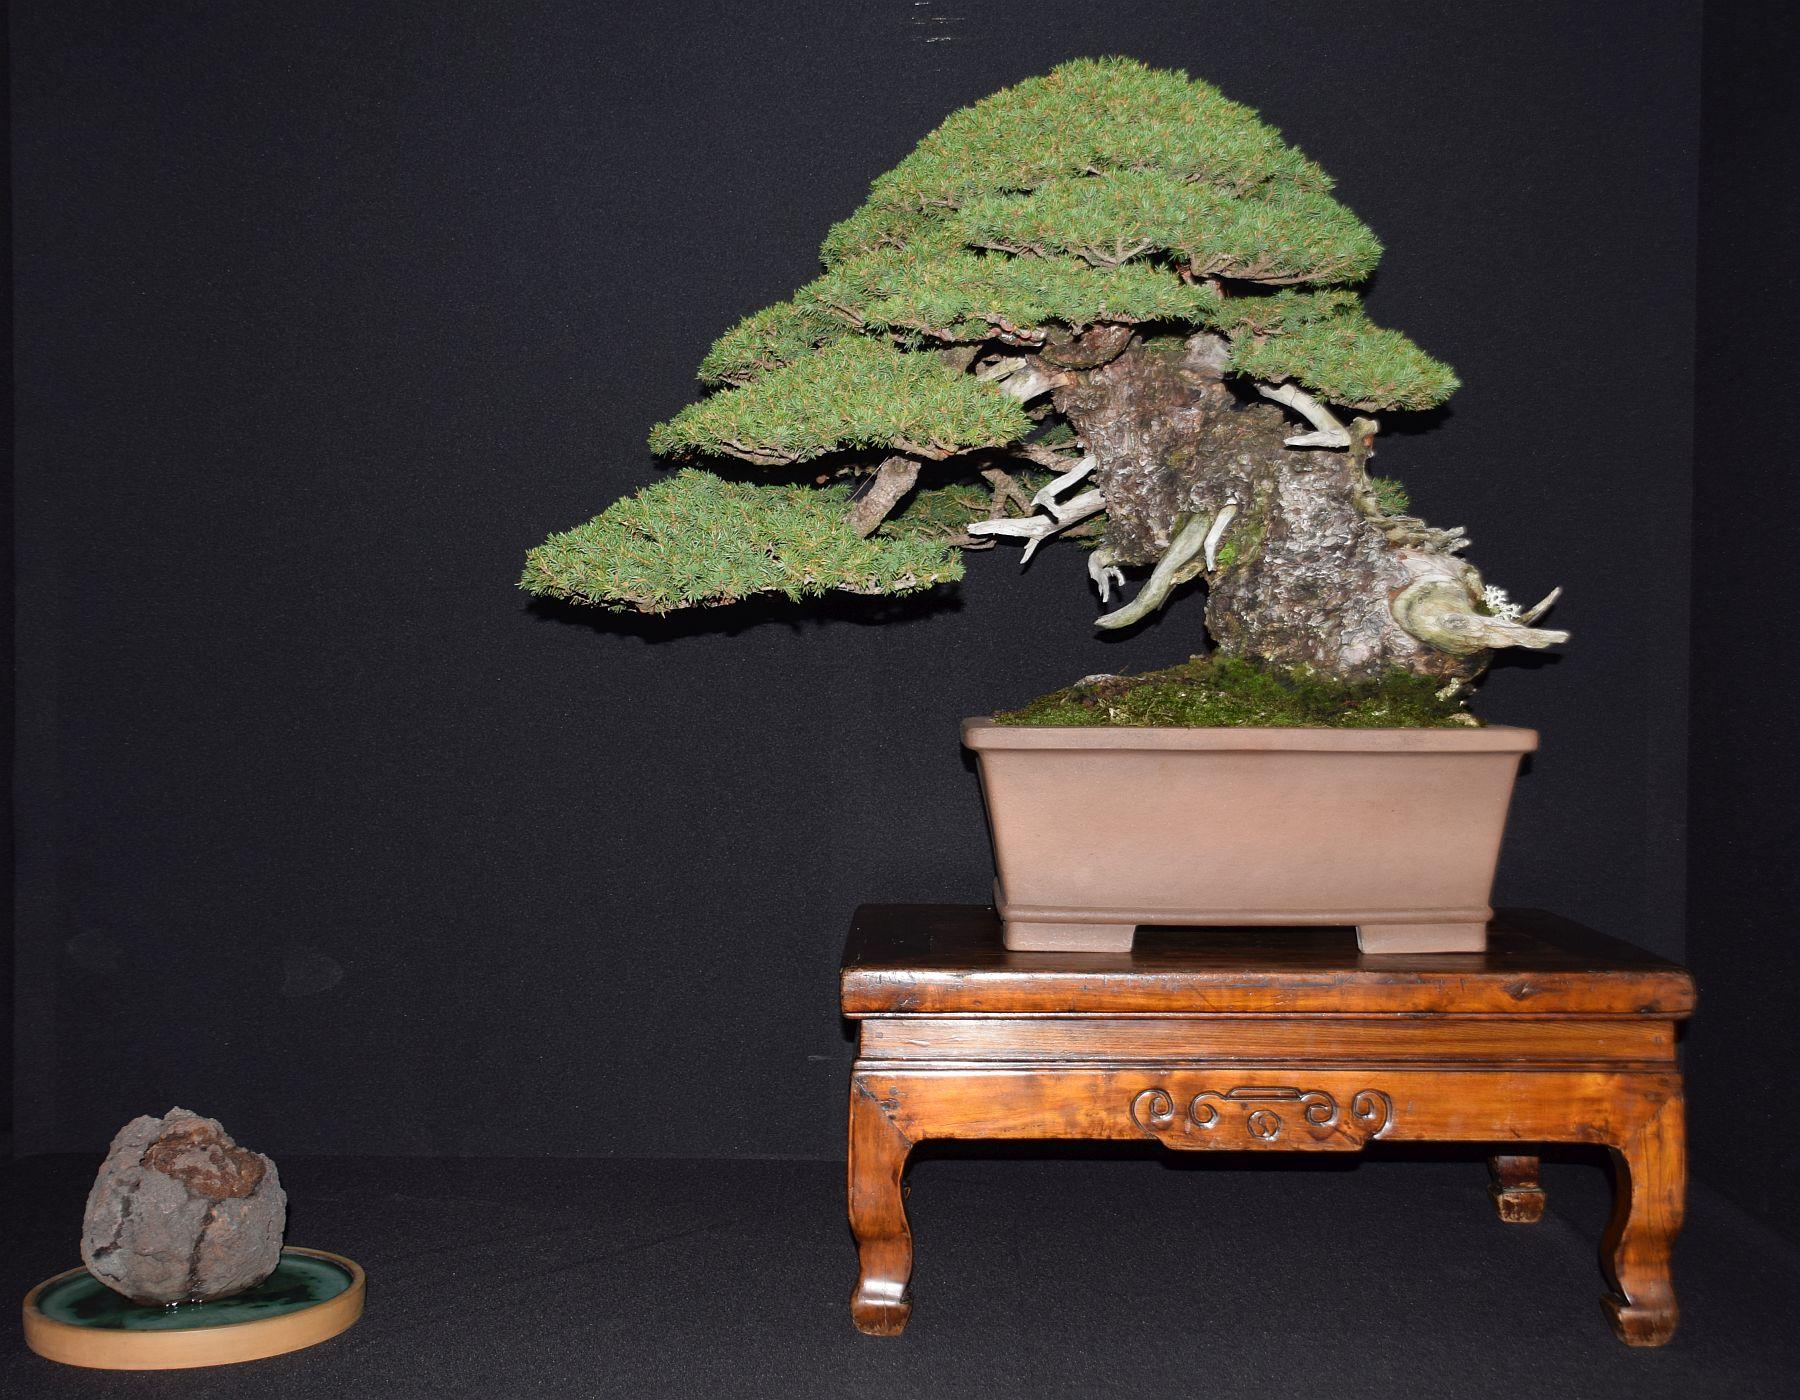 bonsai-museum-luis-vallejo-003